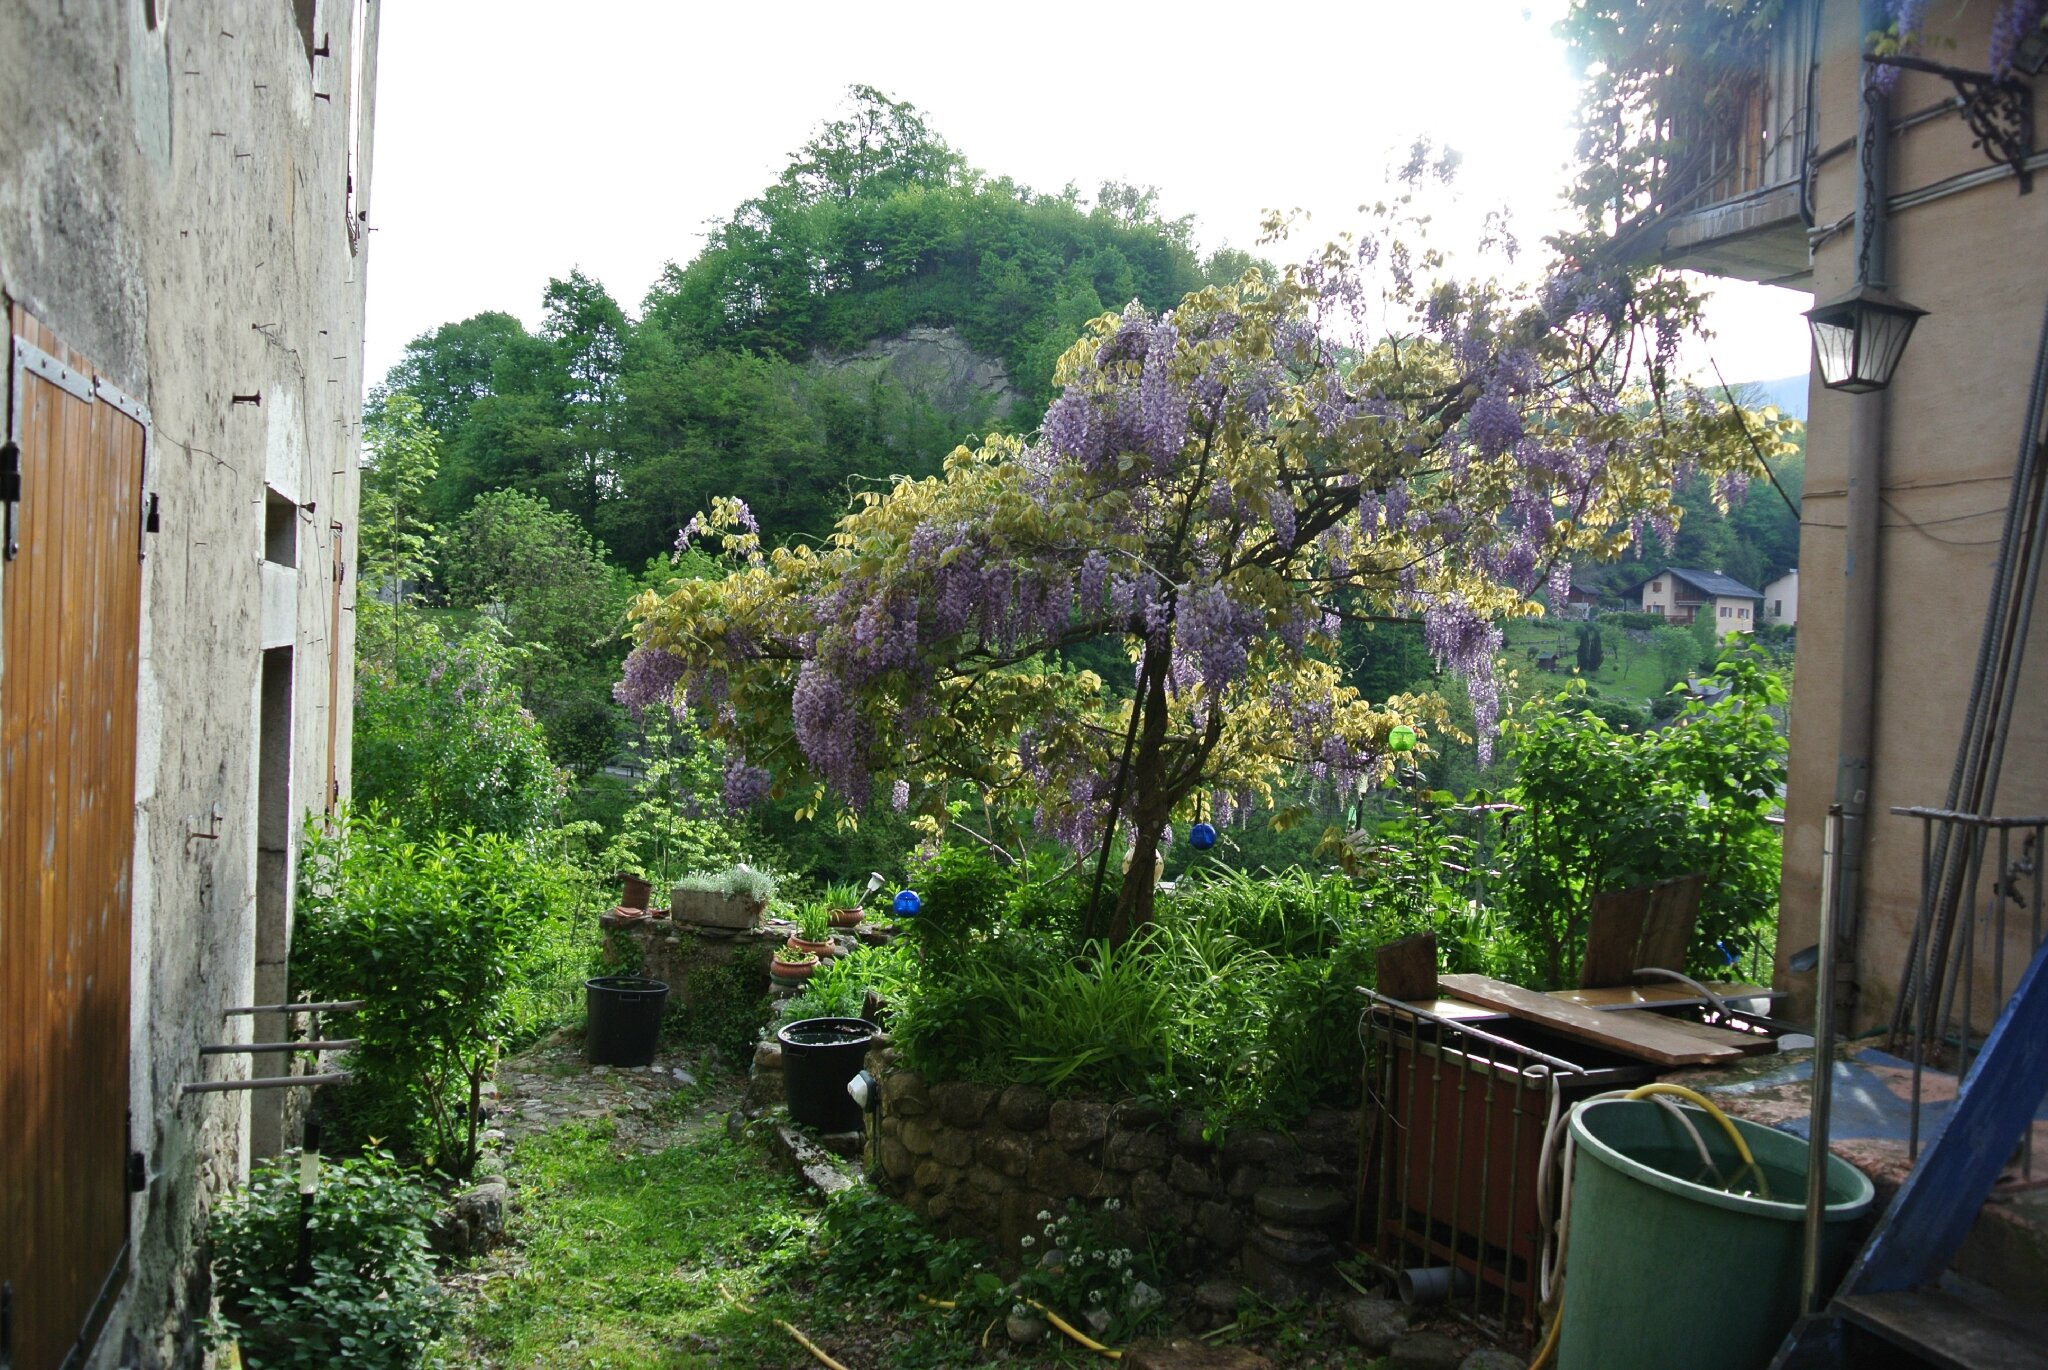 Ce week end on est ouvert aux petits galets for Jardin ouvert ce week end